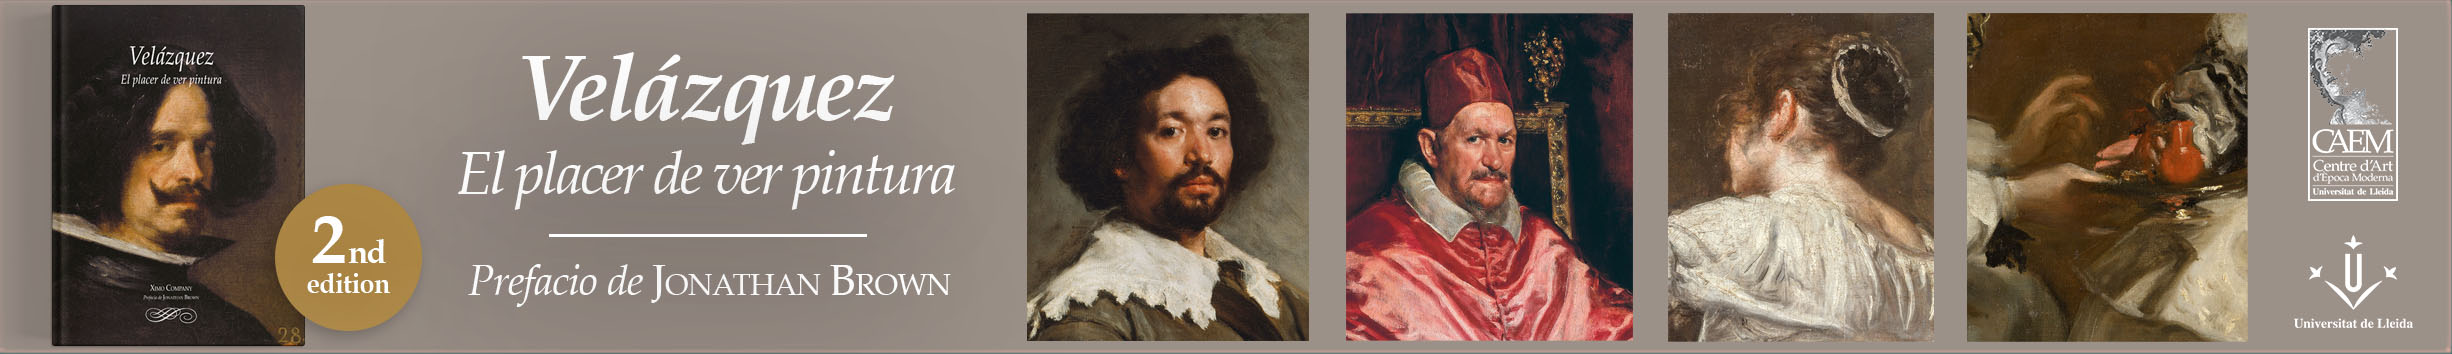 Velázquez el placer de ver pintura